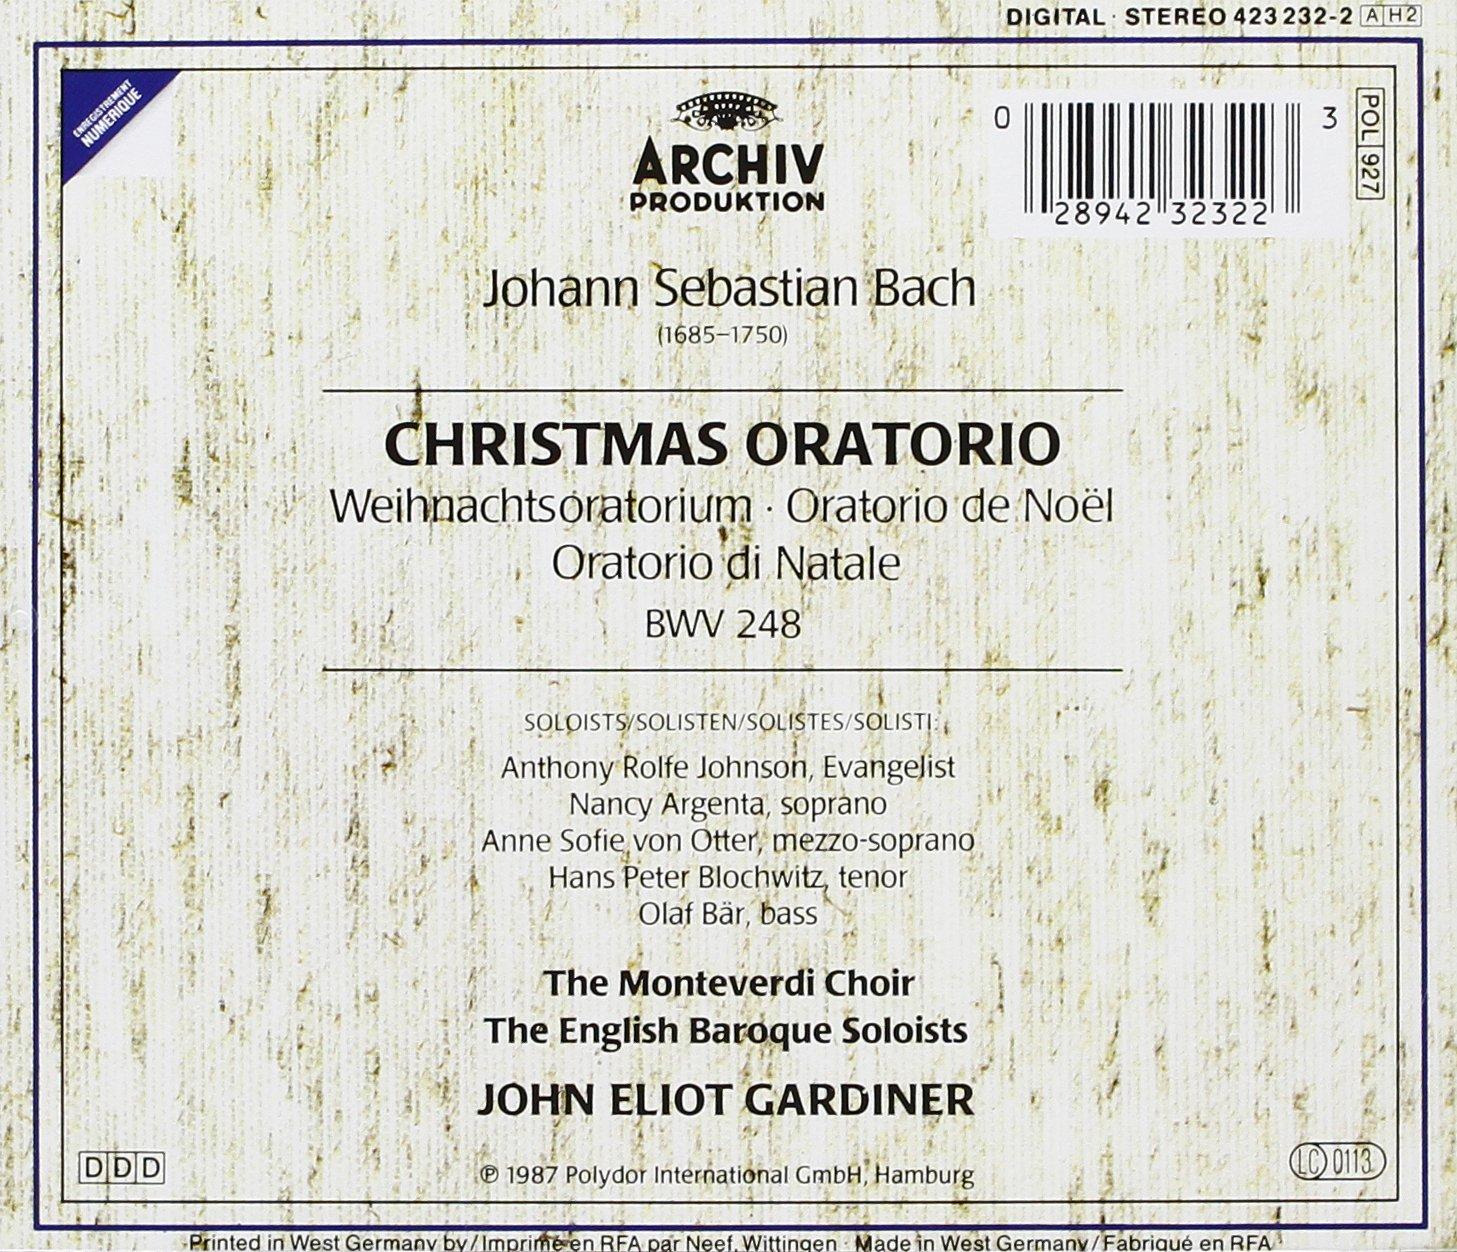 Bach: Christmas Oratorio (Weihnachts Oratorium) by Archiv